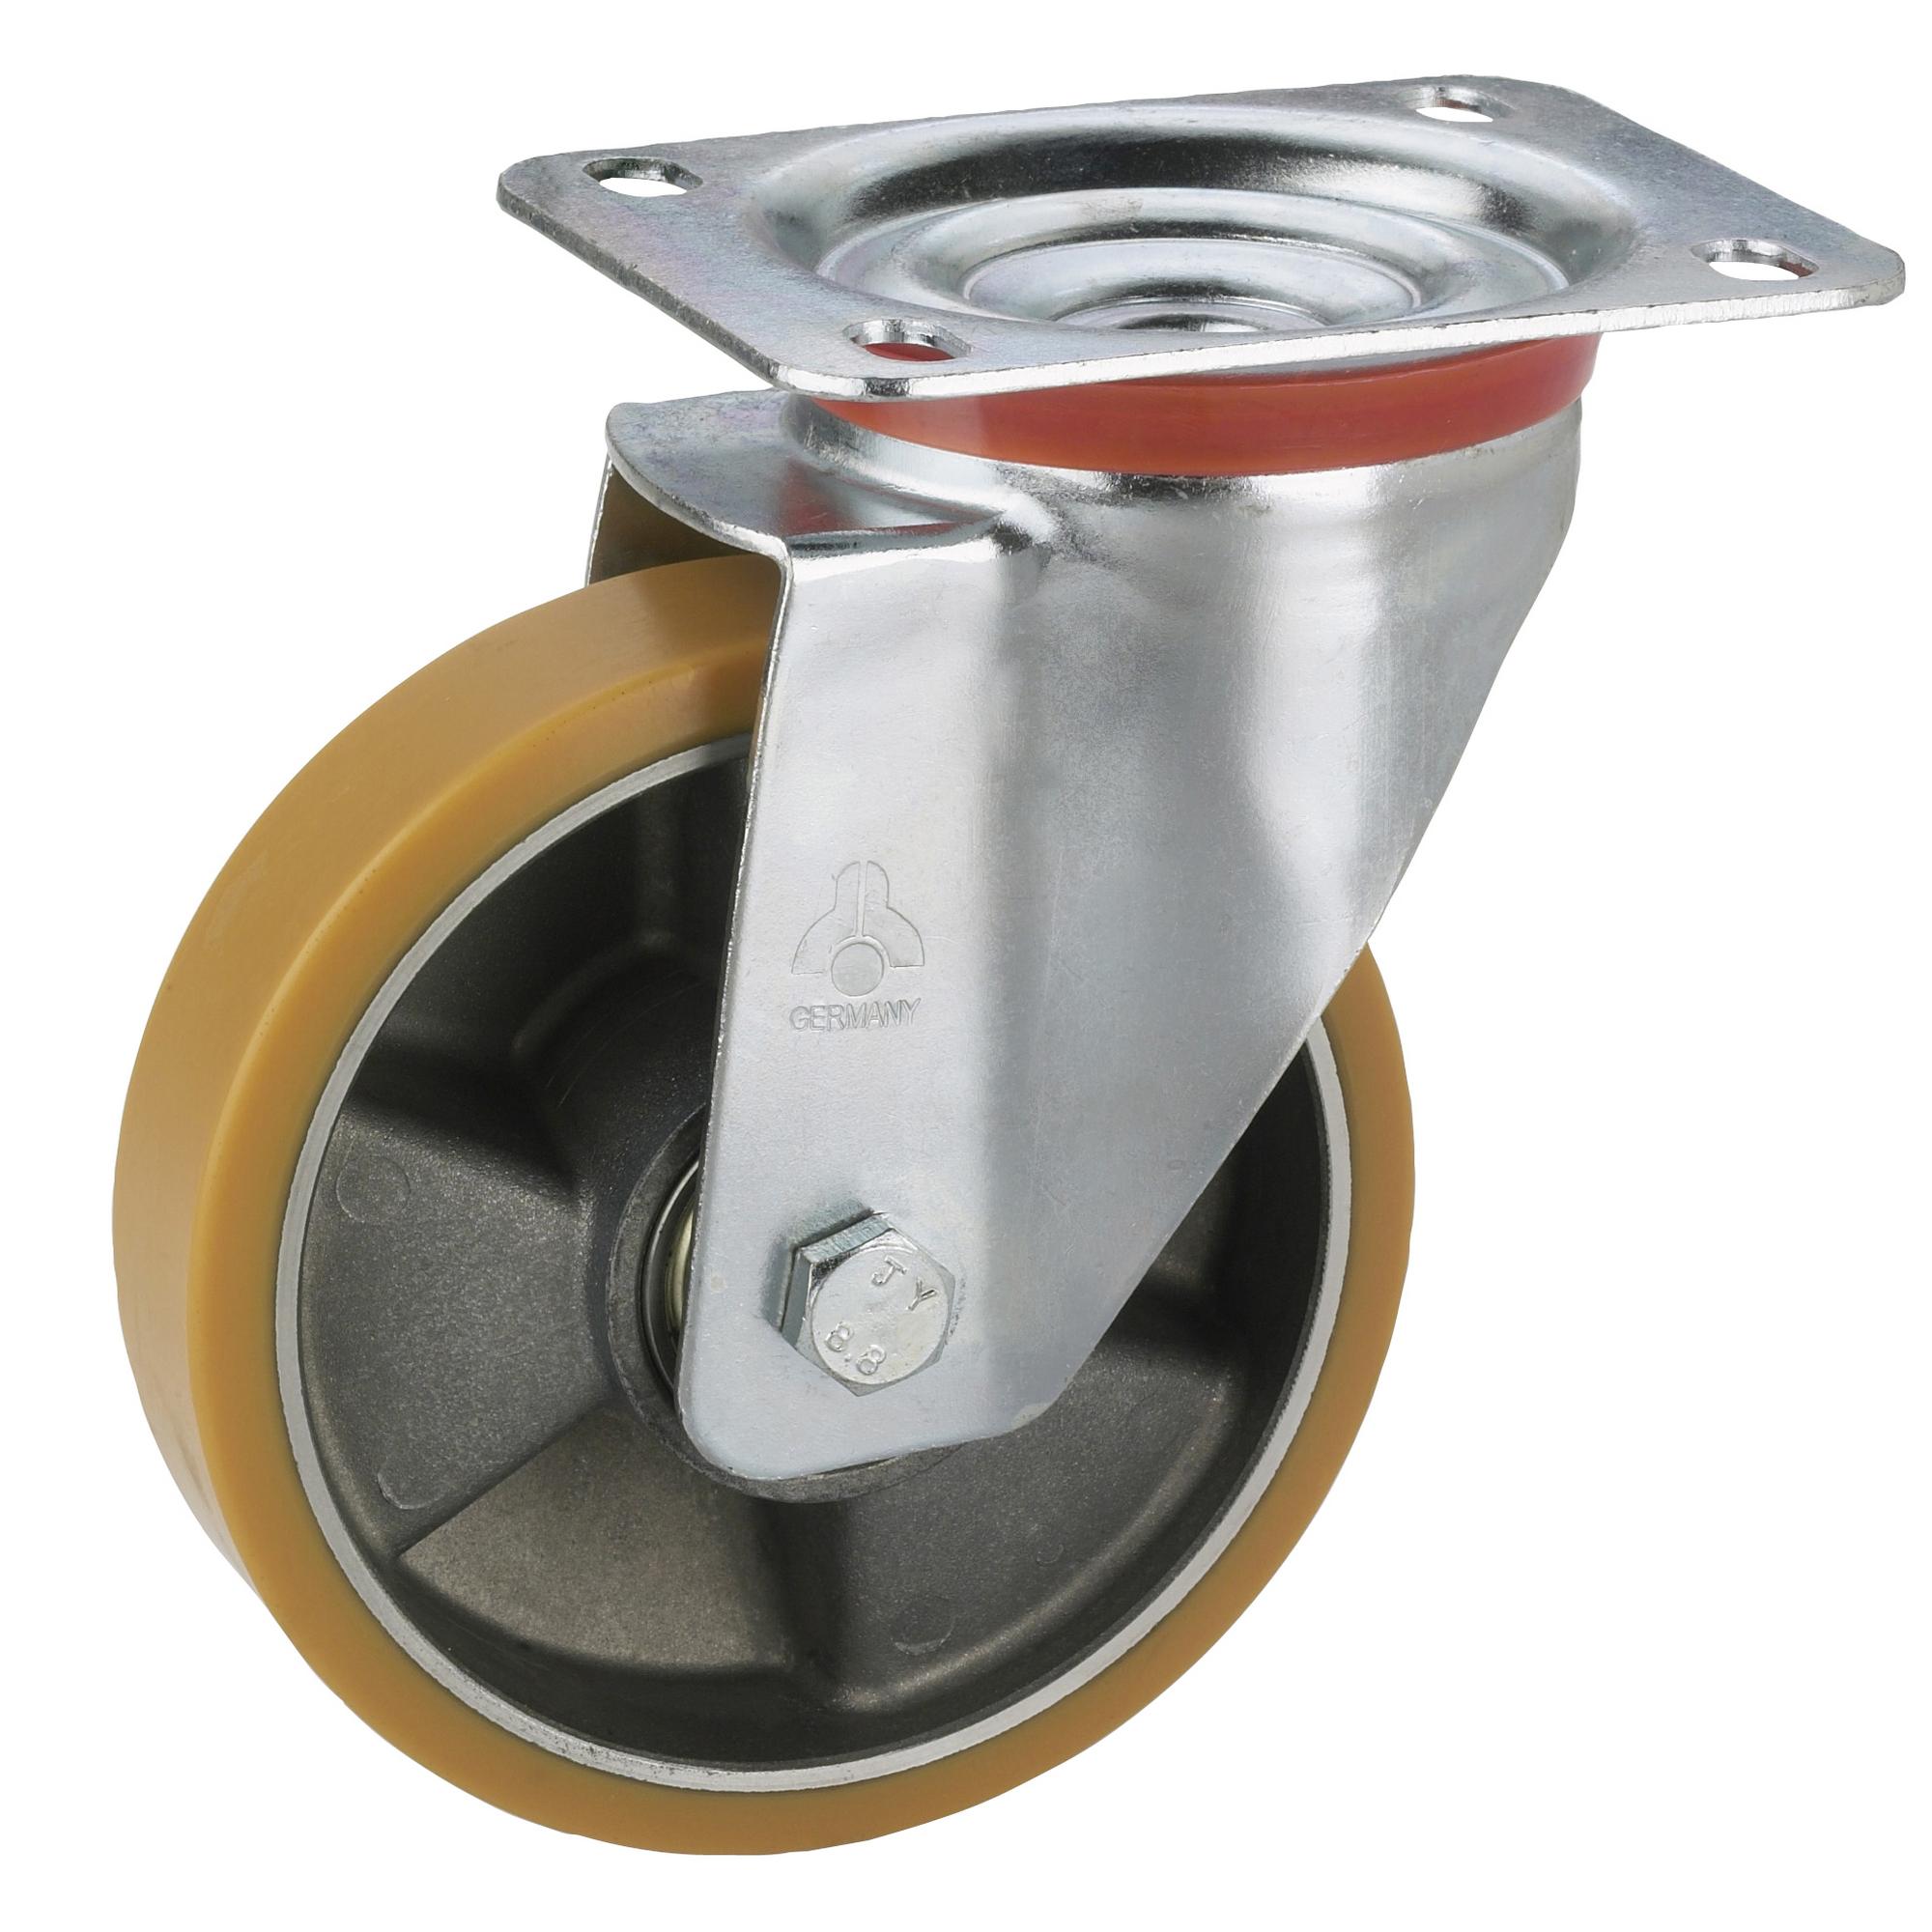 Polyamid-Lenkrolle mit Feststellrolle 125 x 35 mm//Platte 100 x 85 mm